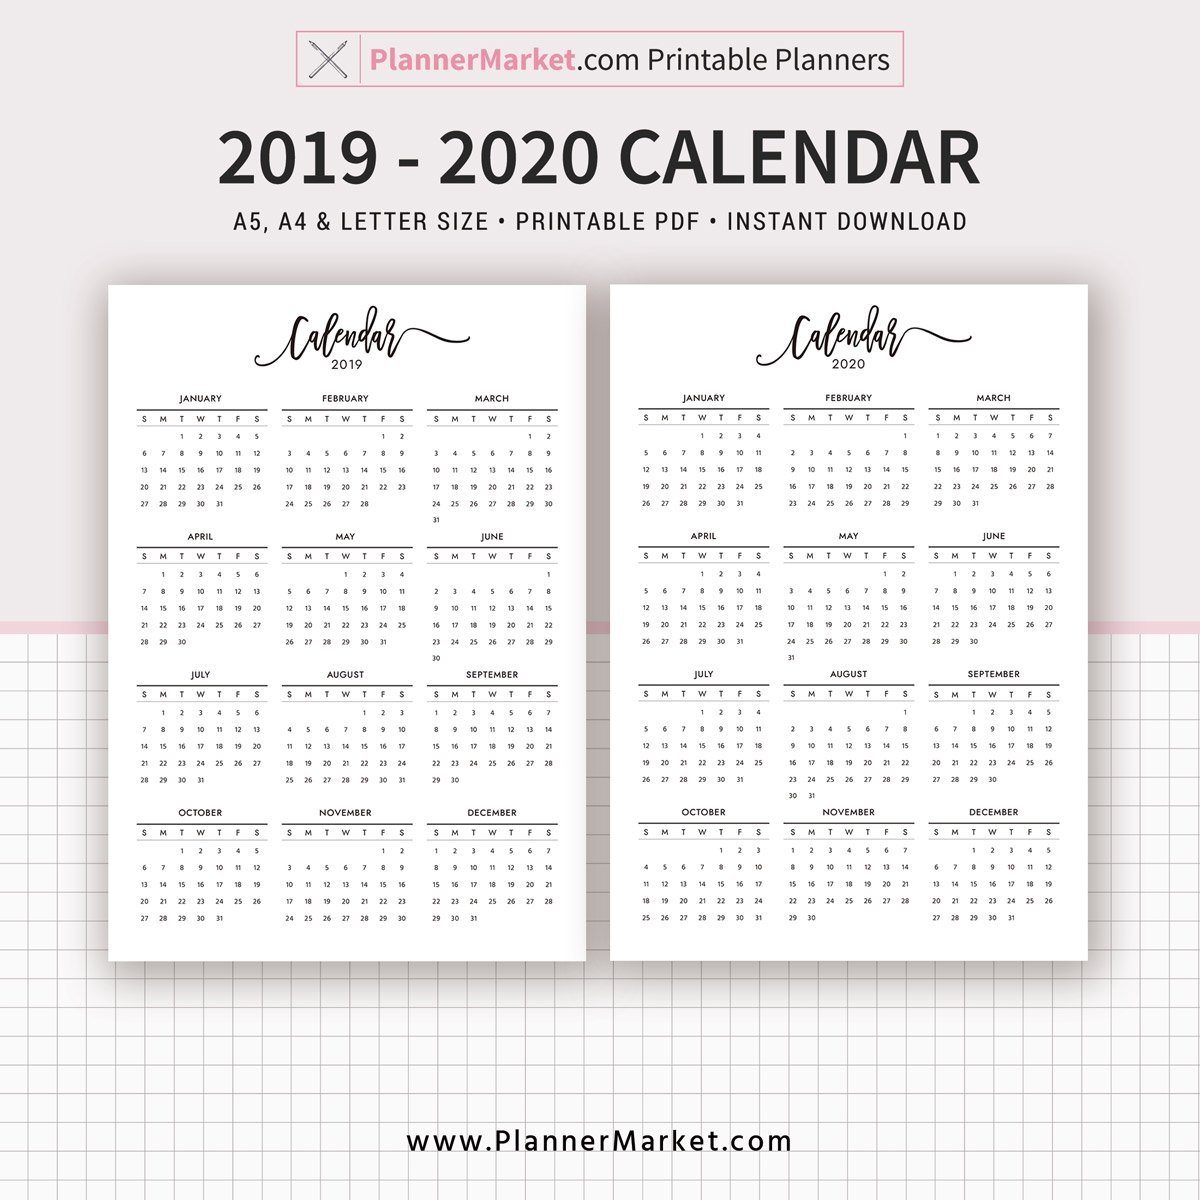 2019-2020 Calendar Printable, A5, A4, Letter Size, Planner Refill Calendar 2019 Refill